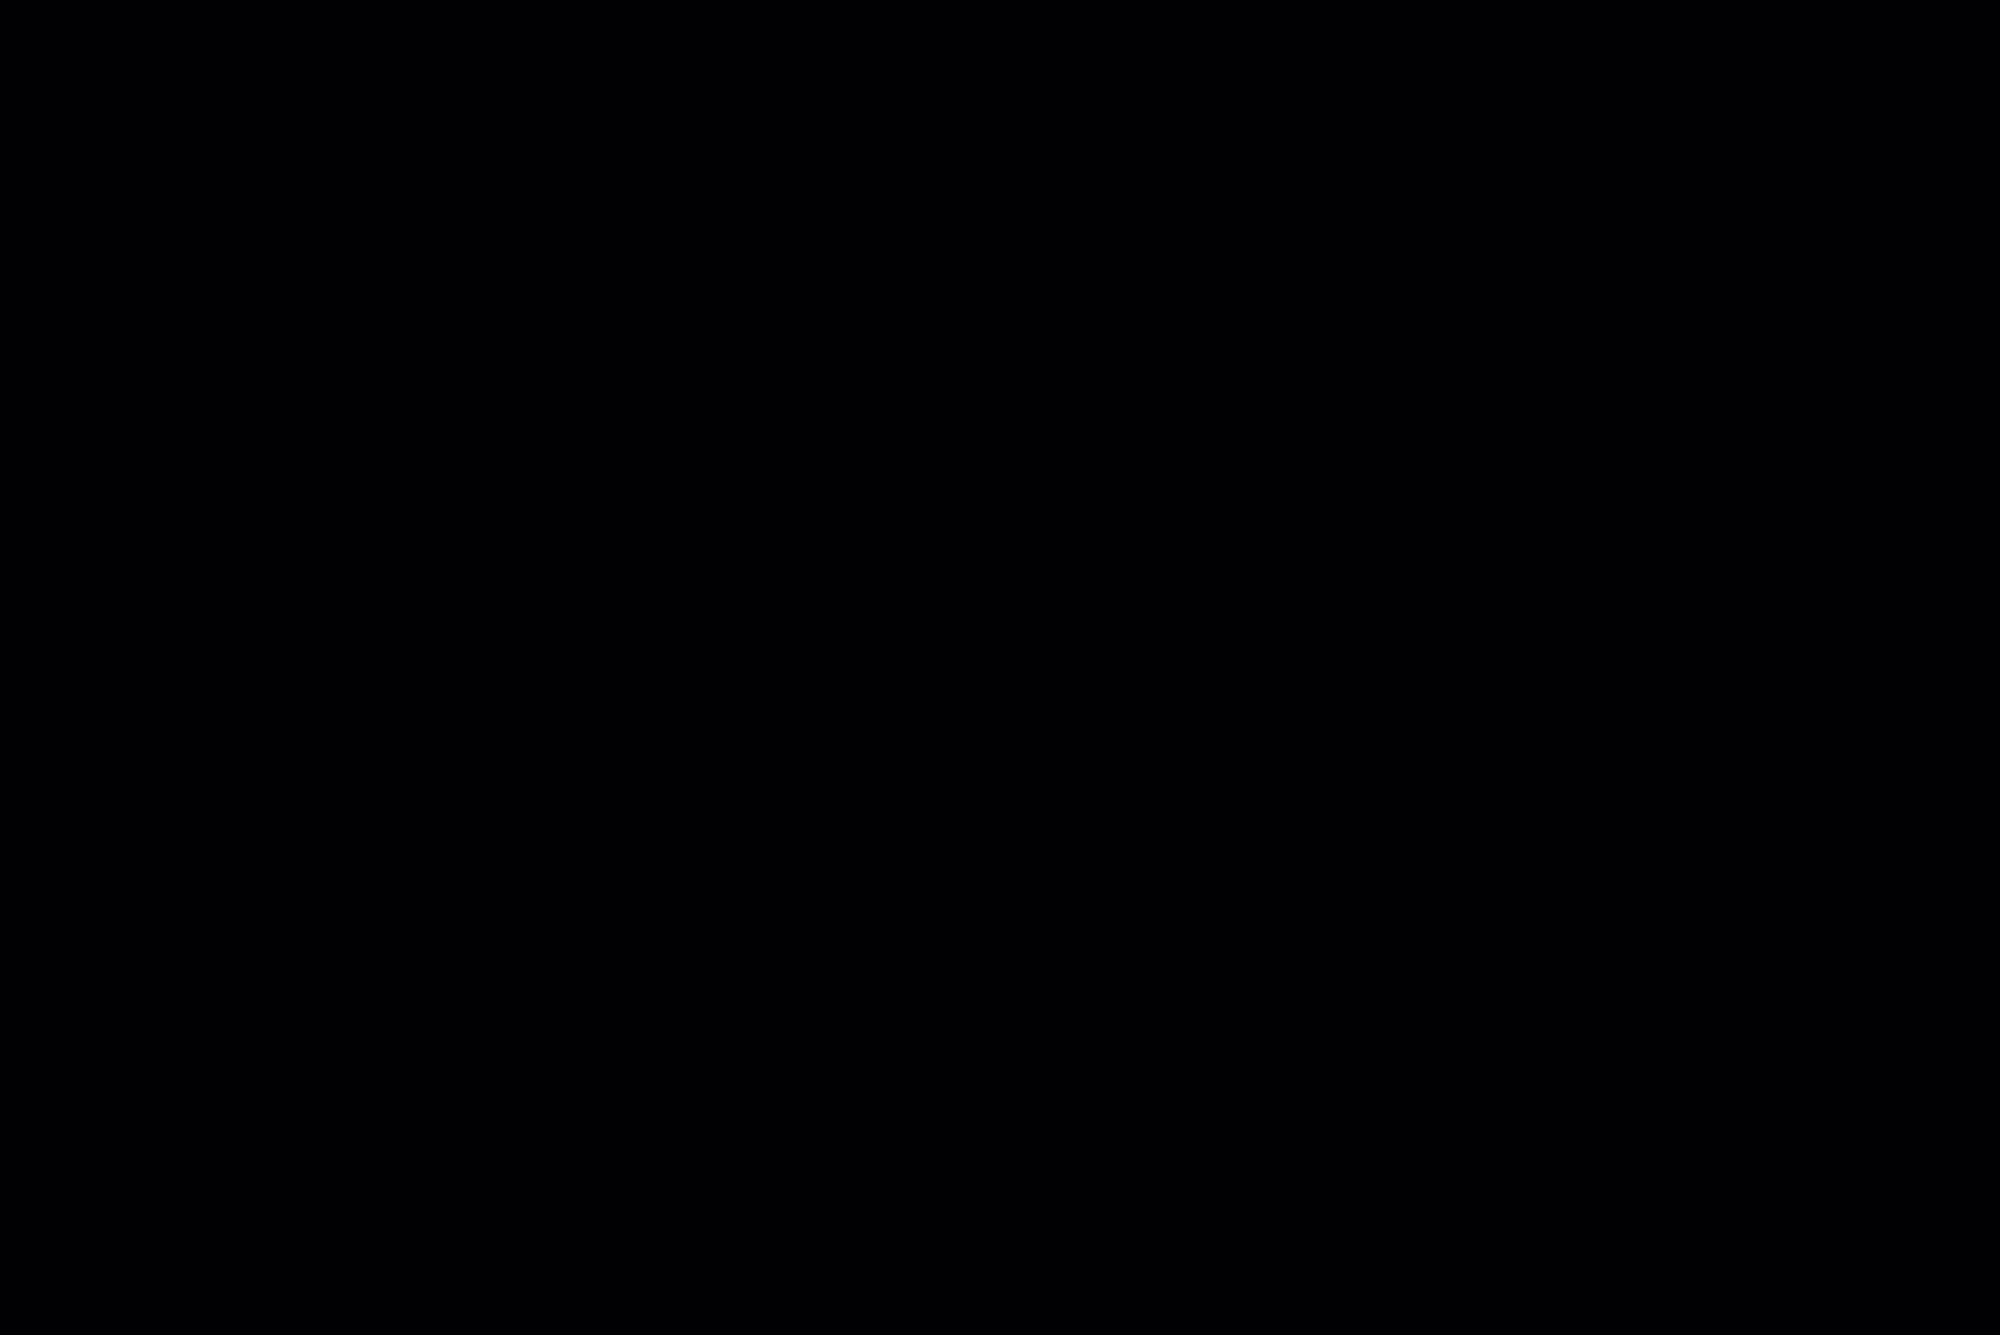 SA1 2099